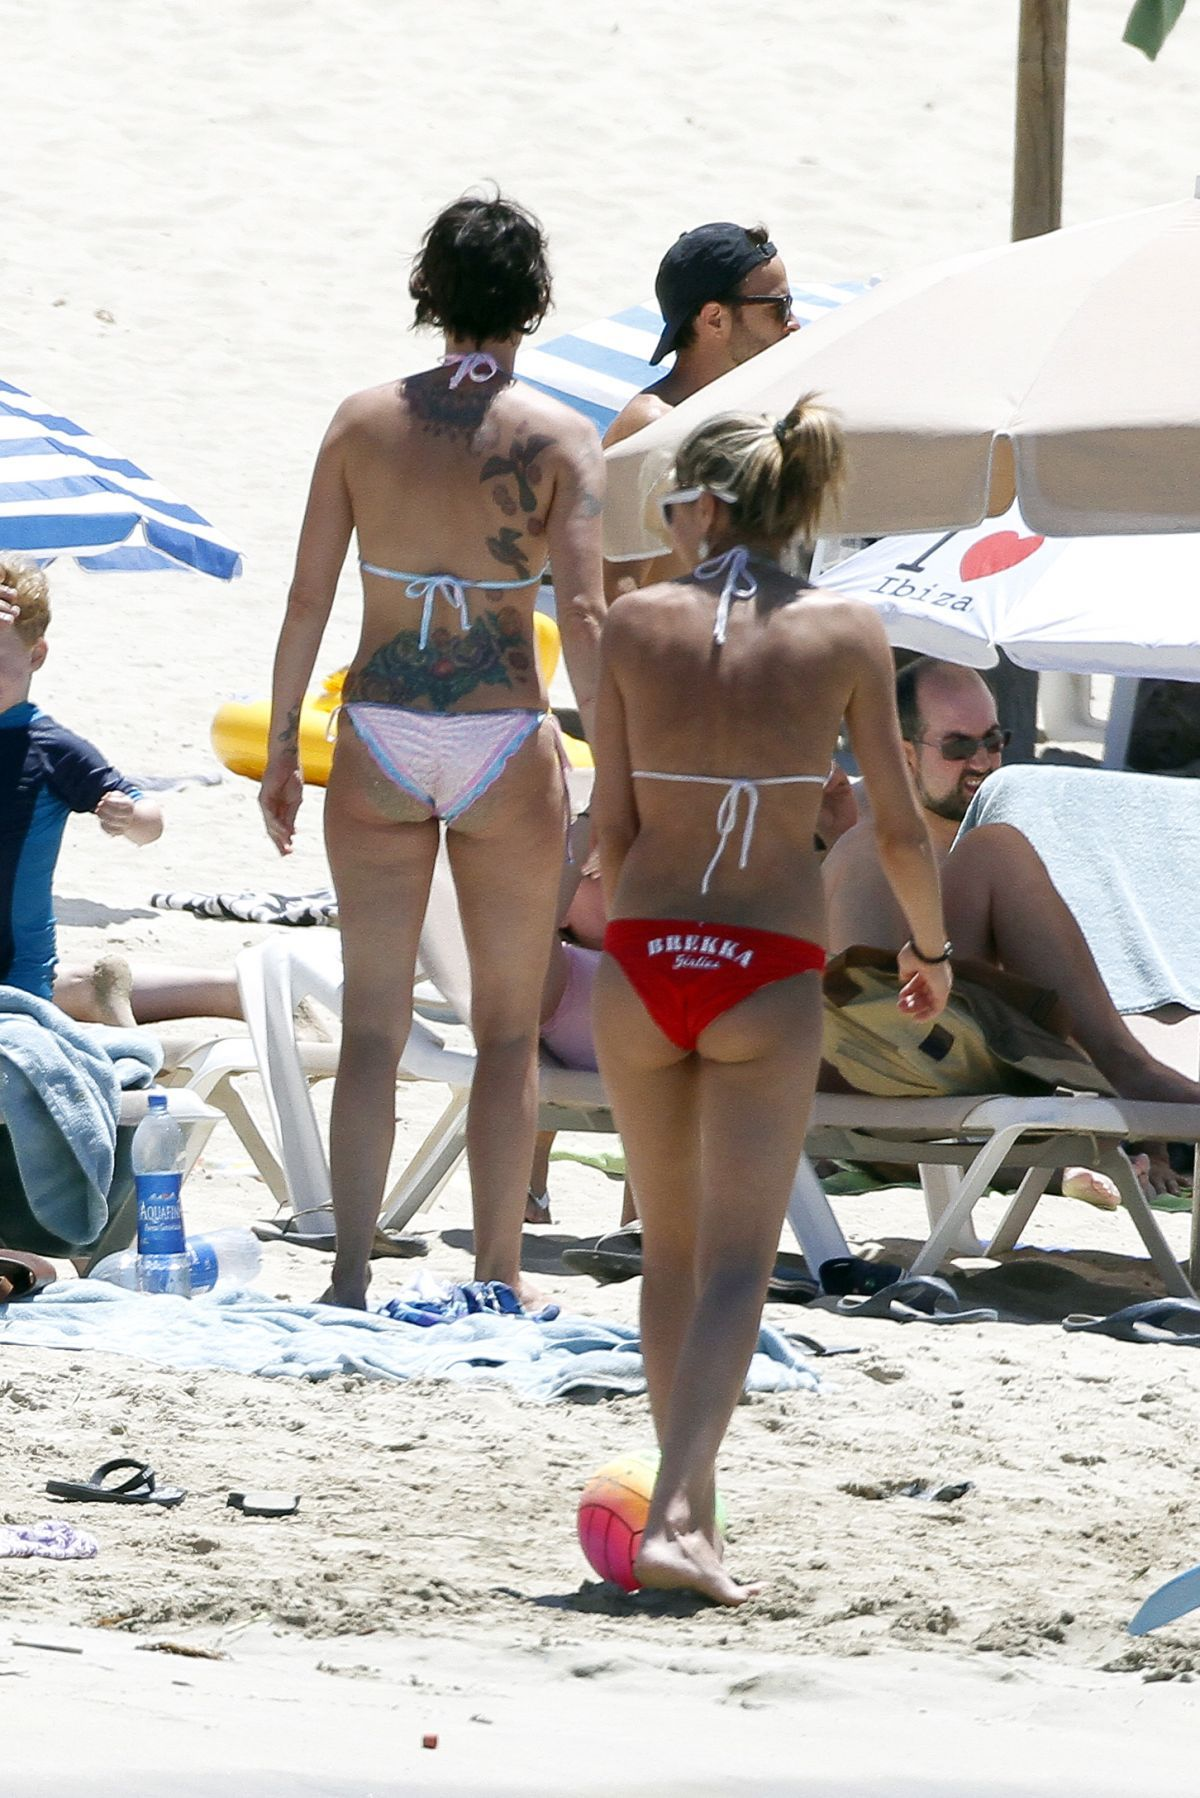 Bikini Elle Fanning nudes (34 photo), Ass, Paparazzi, Twitter, cleavage 2018